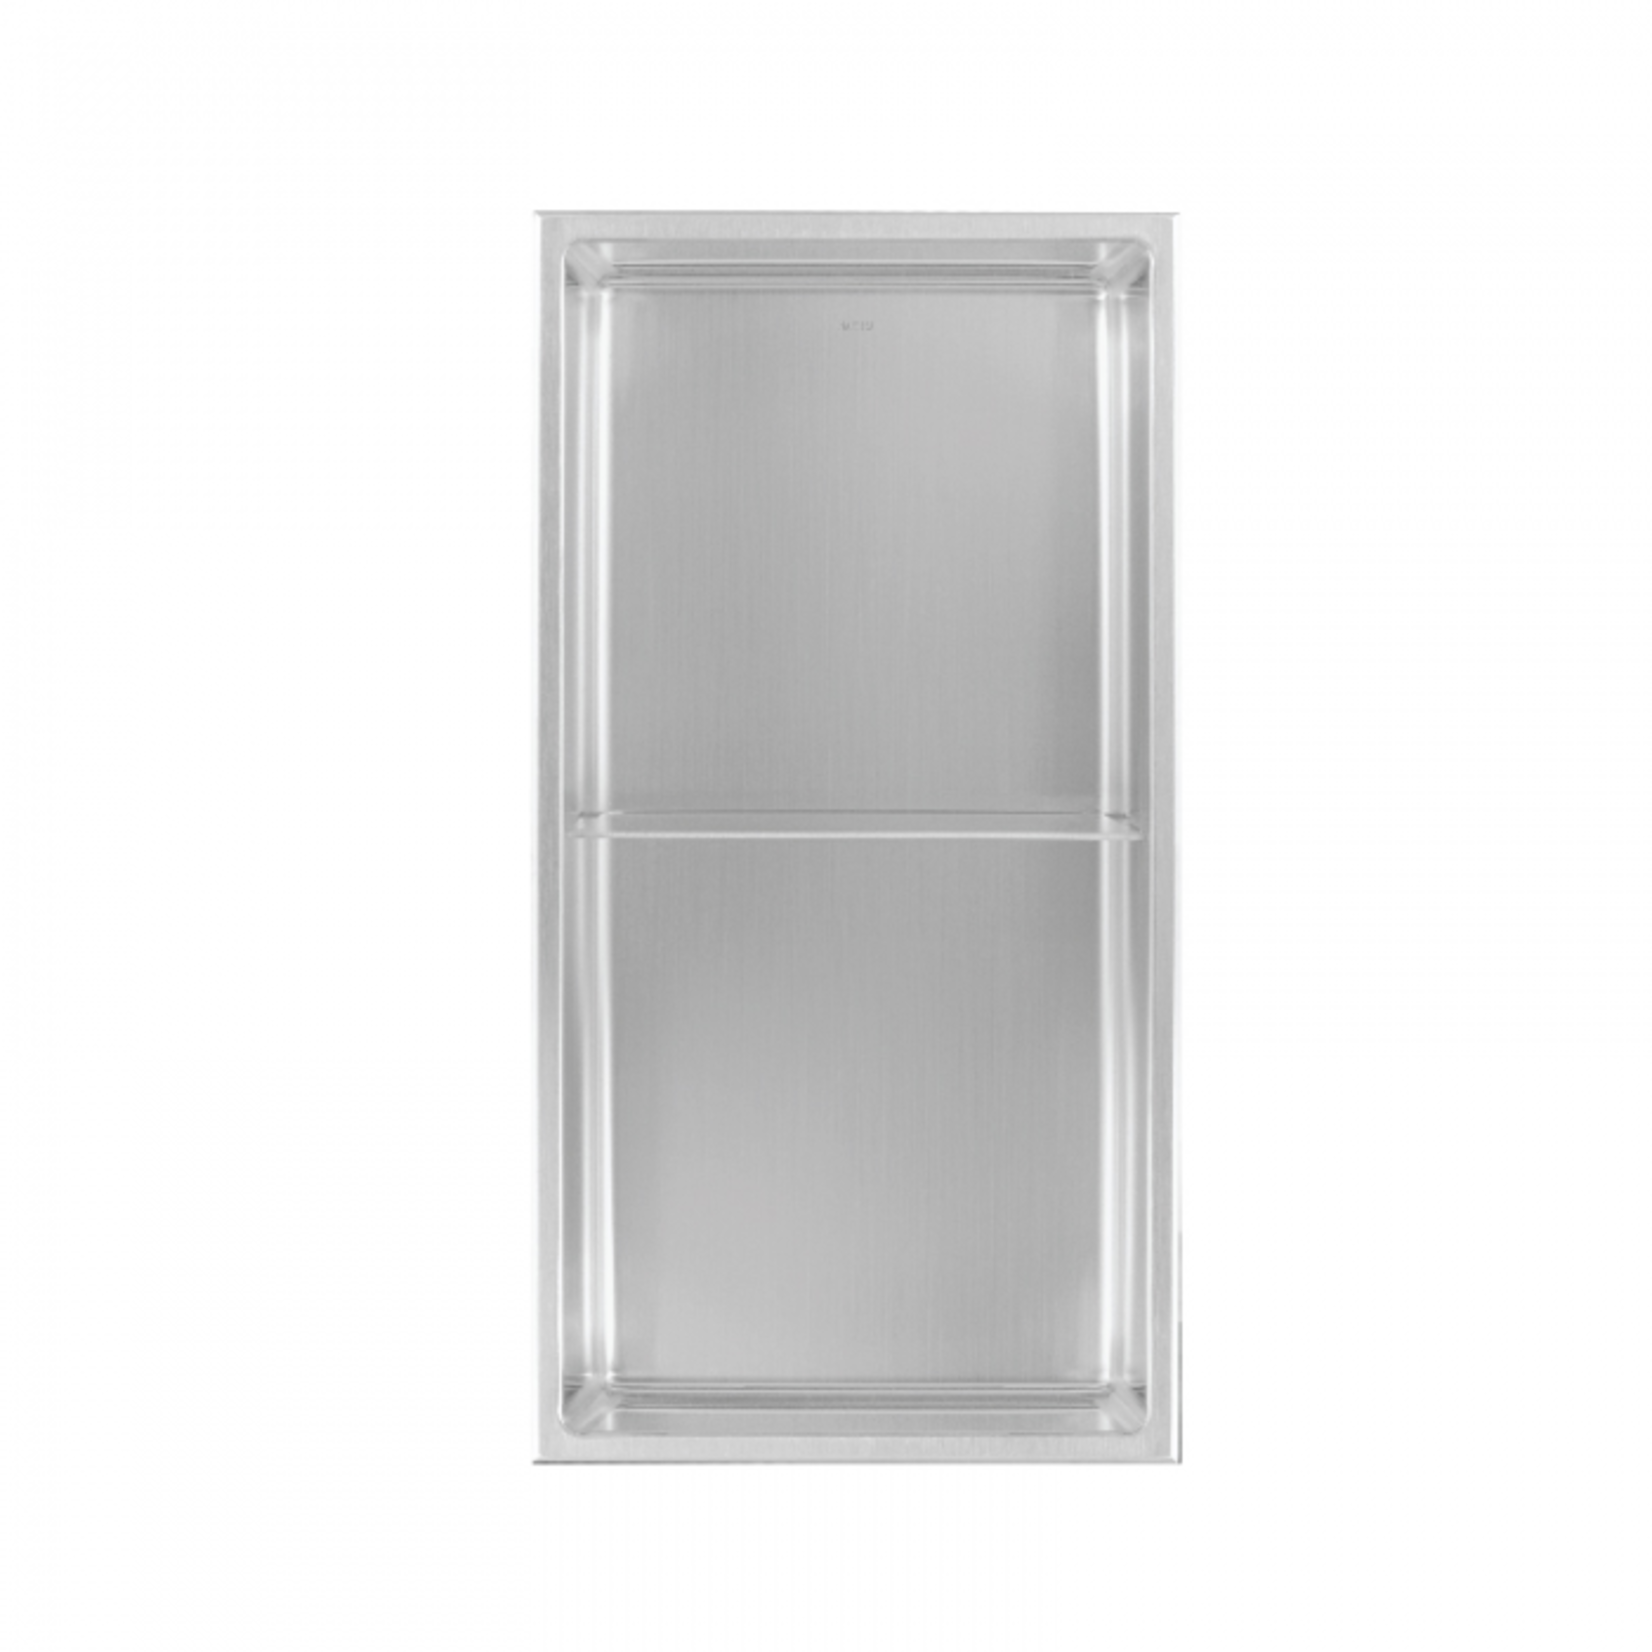 Wall niche with shelf 24x12 Stainless steel Nautika NI2412T